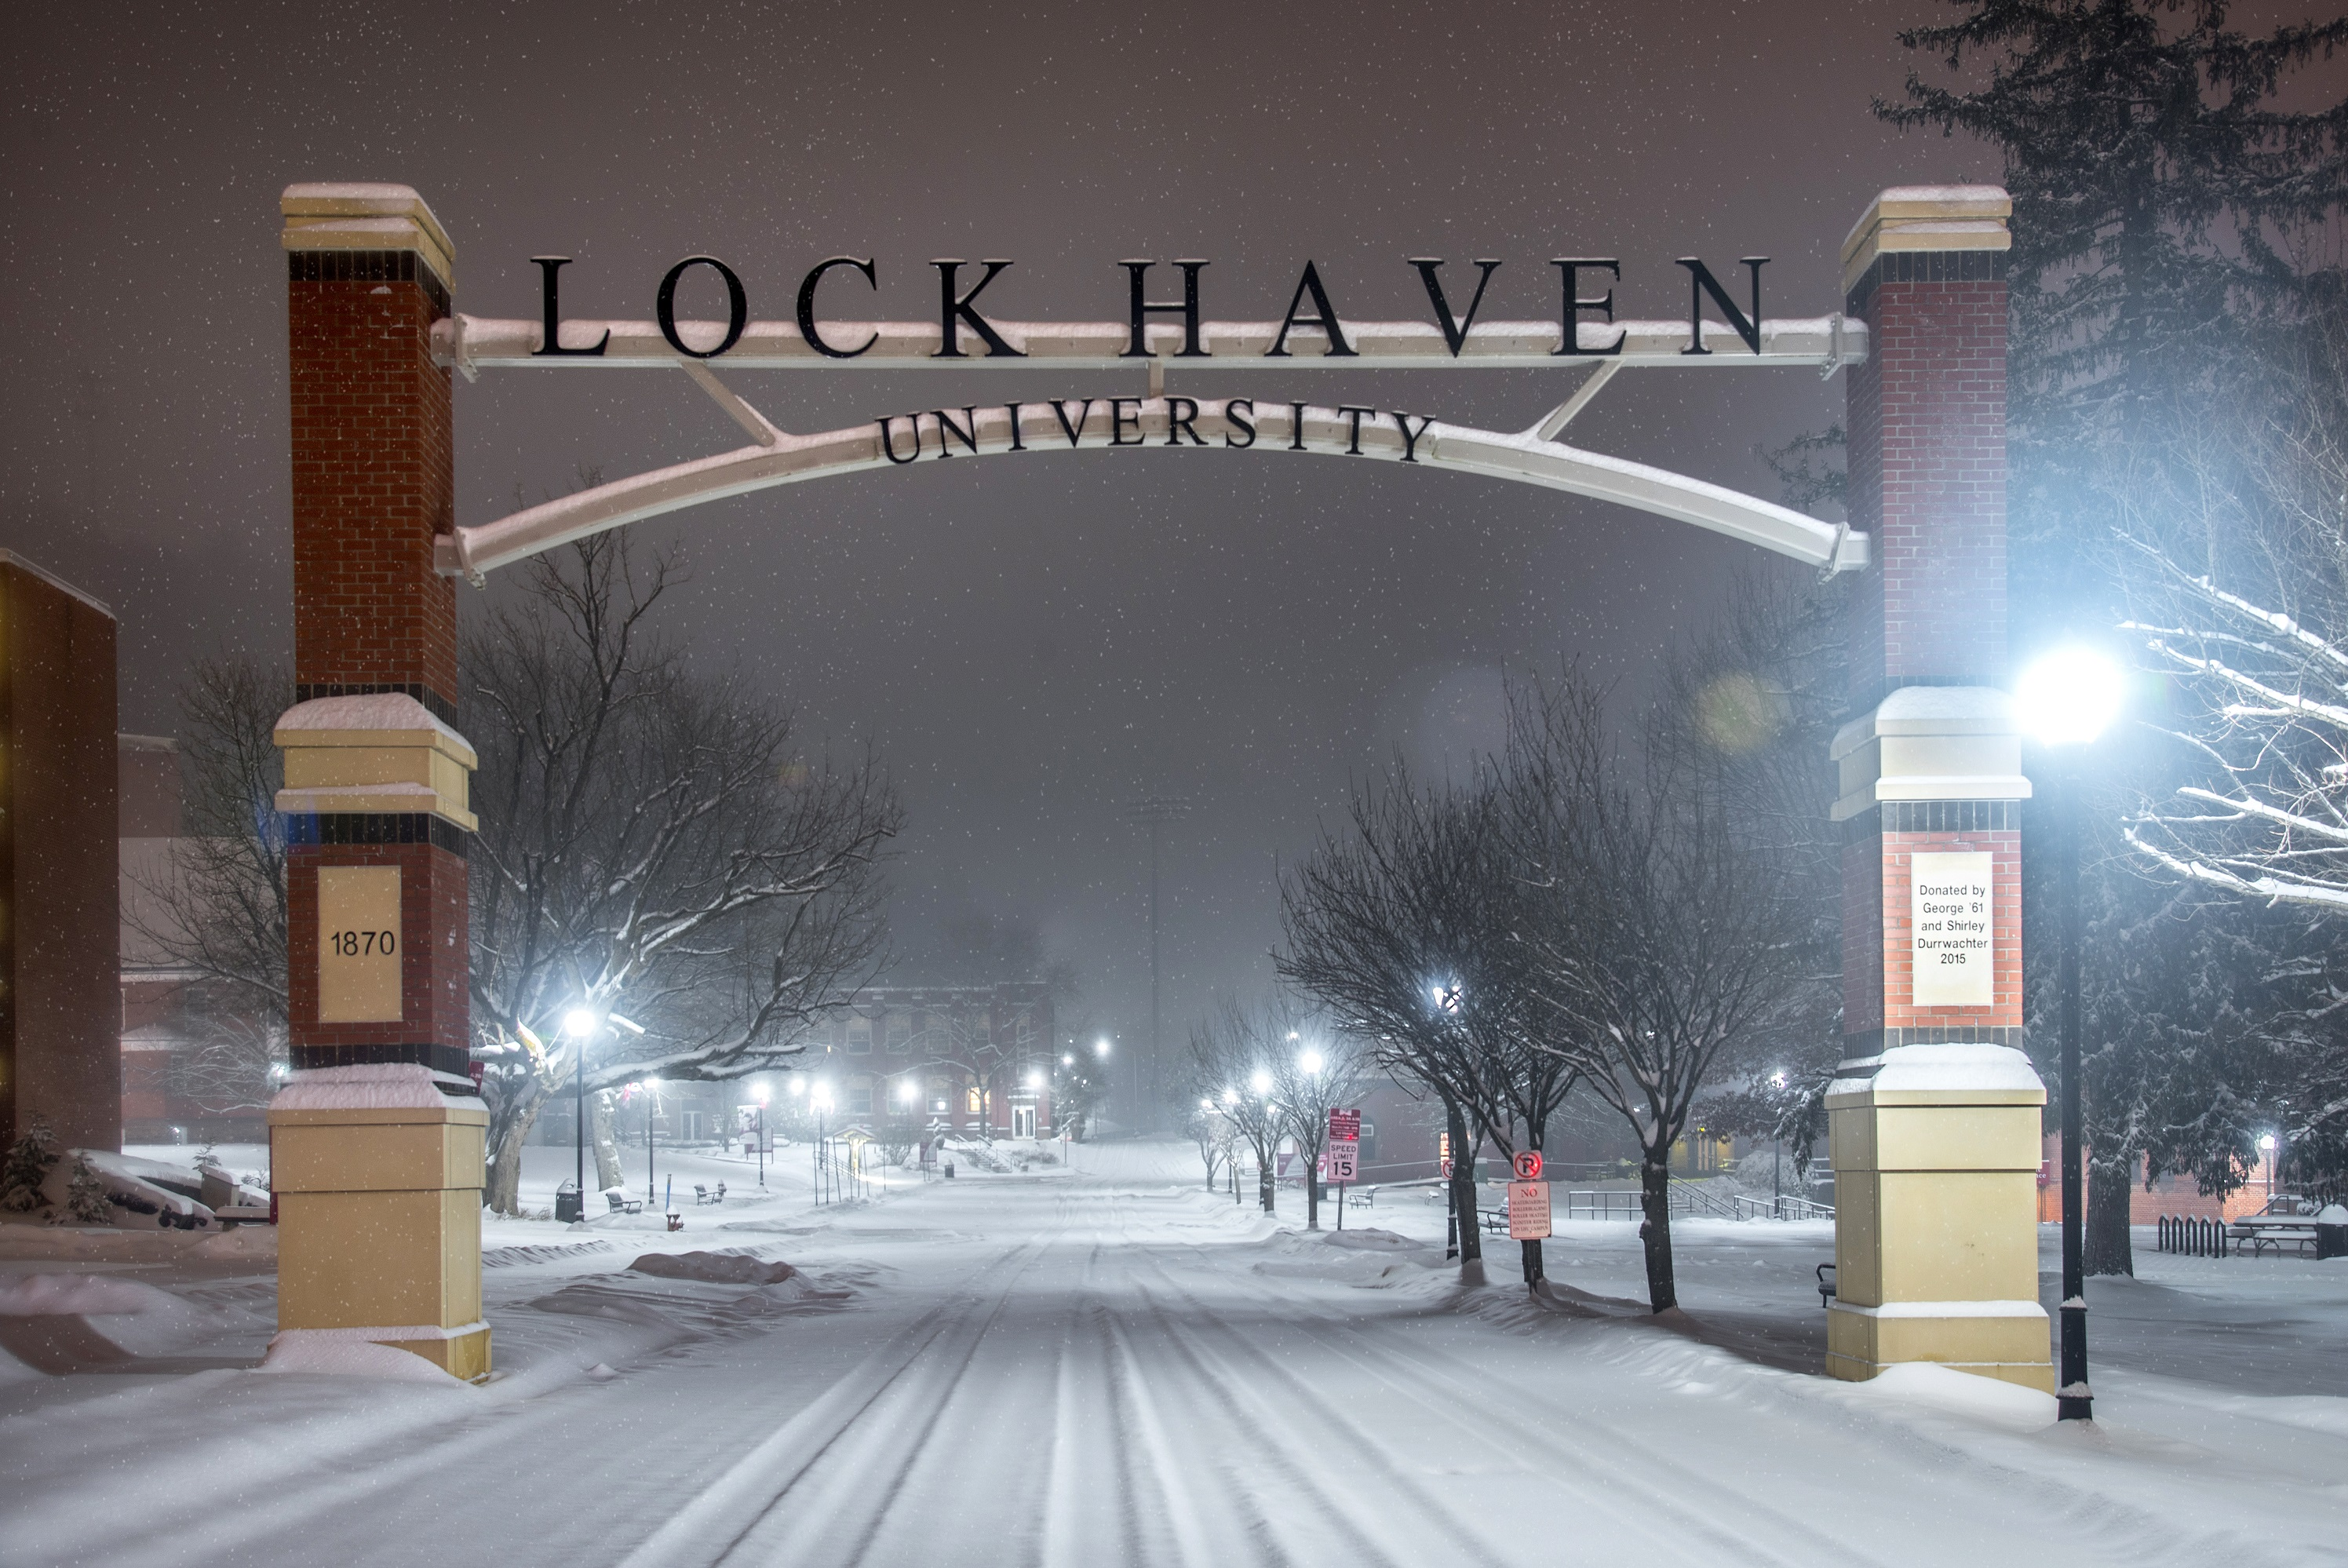 10 Hardest Courses at Lock Haven University